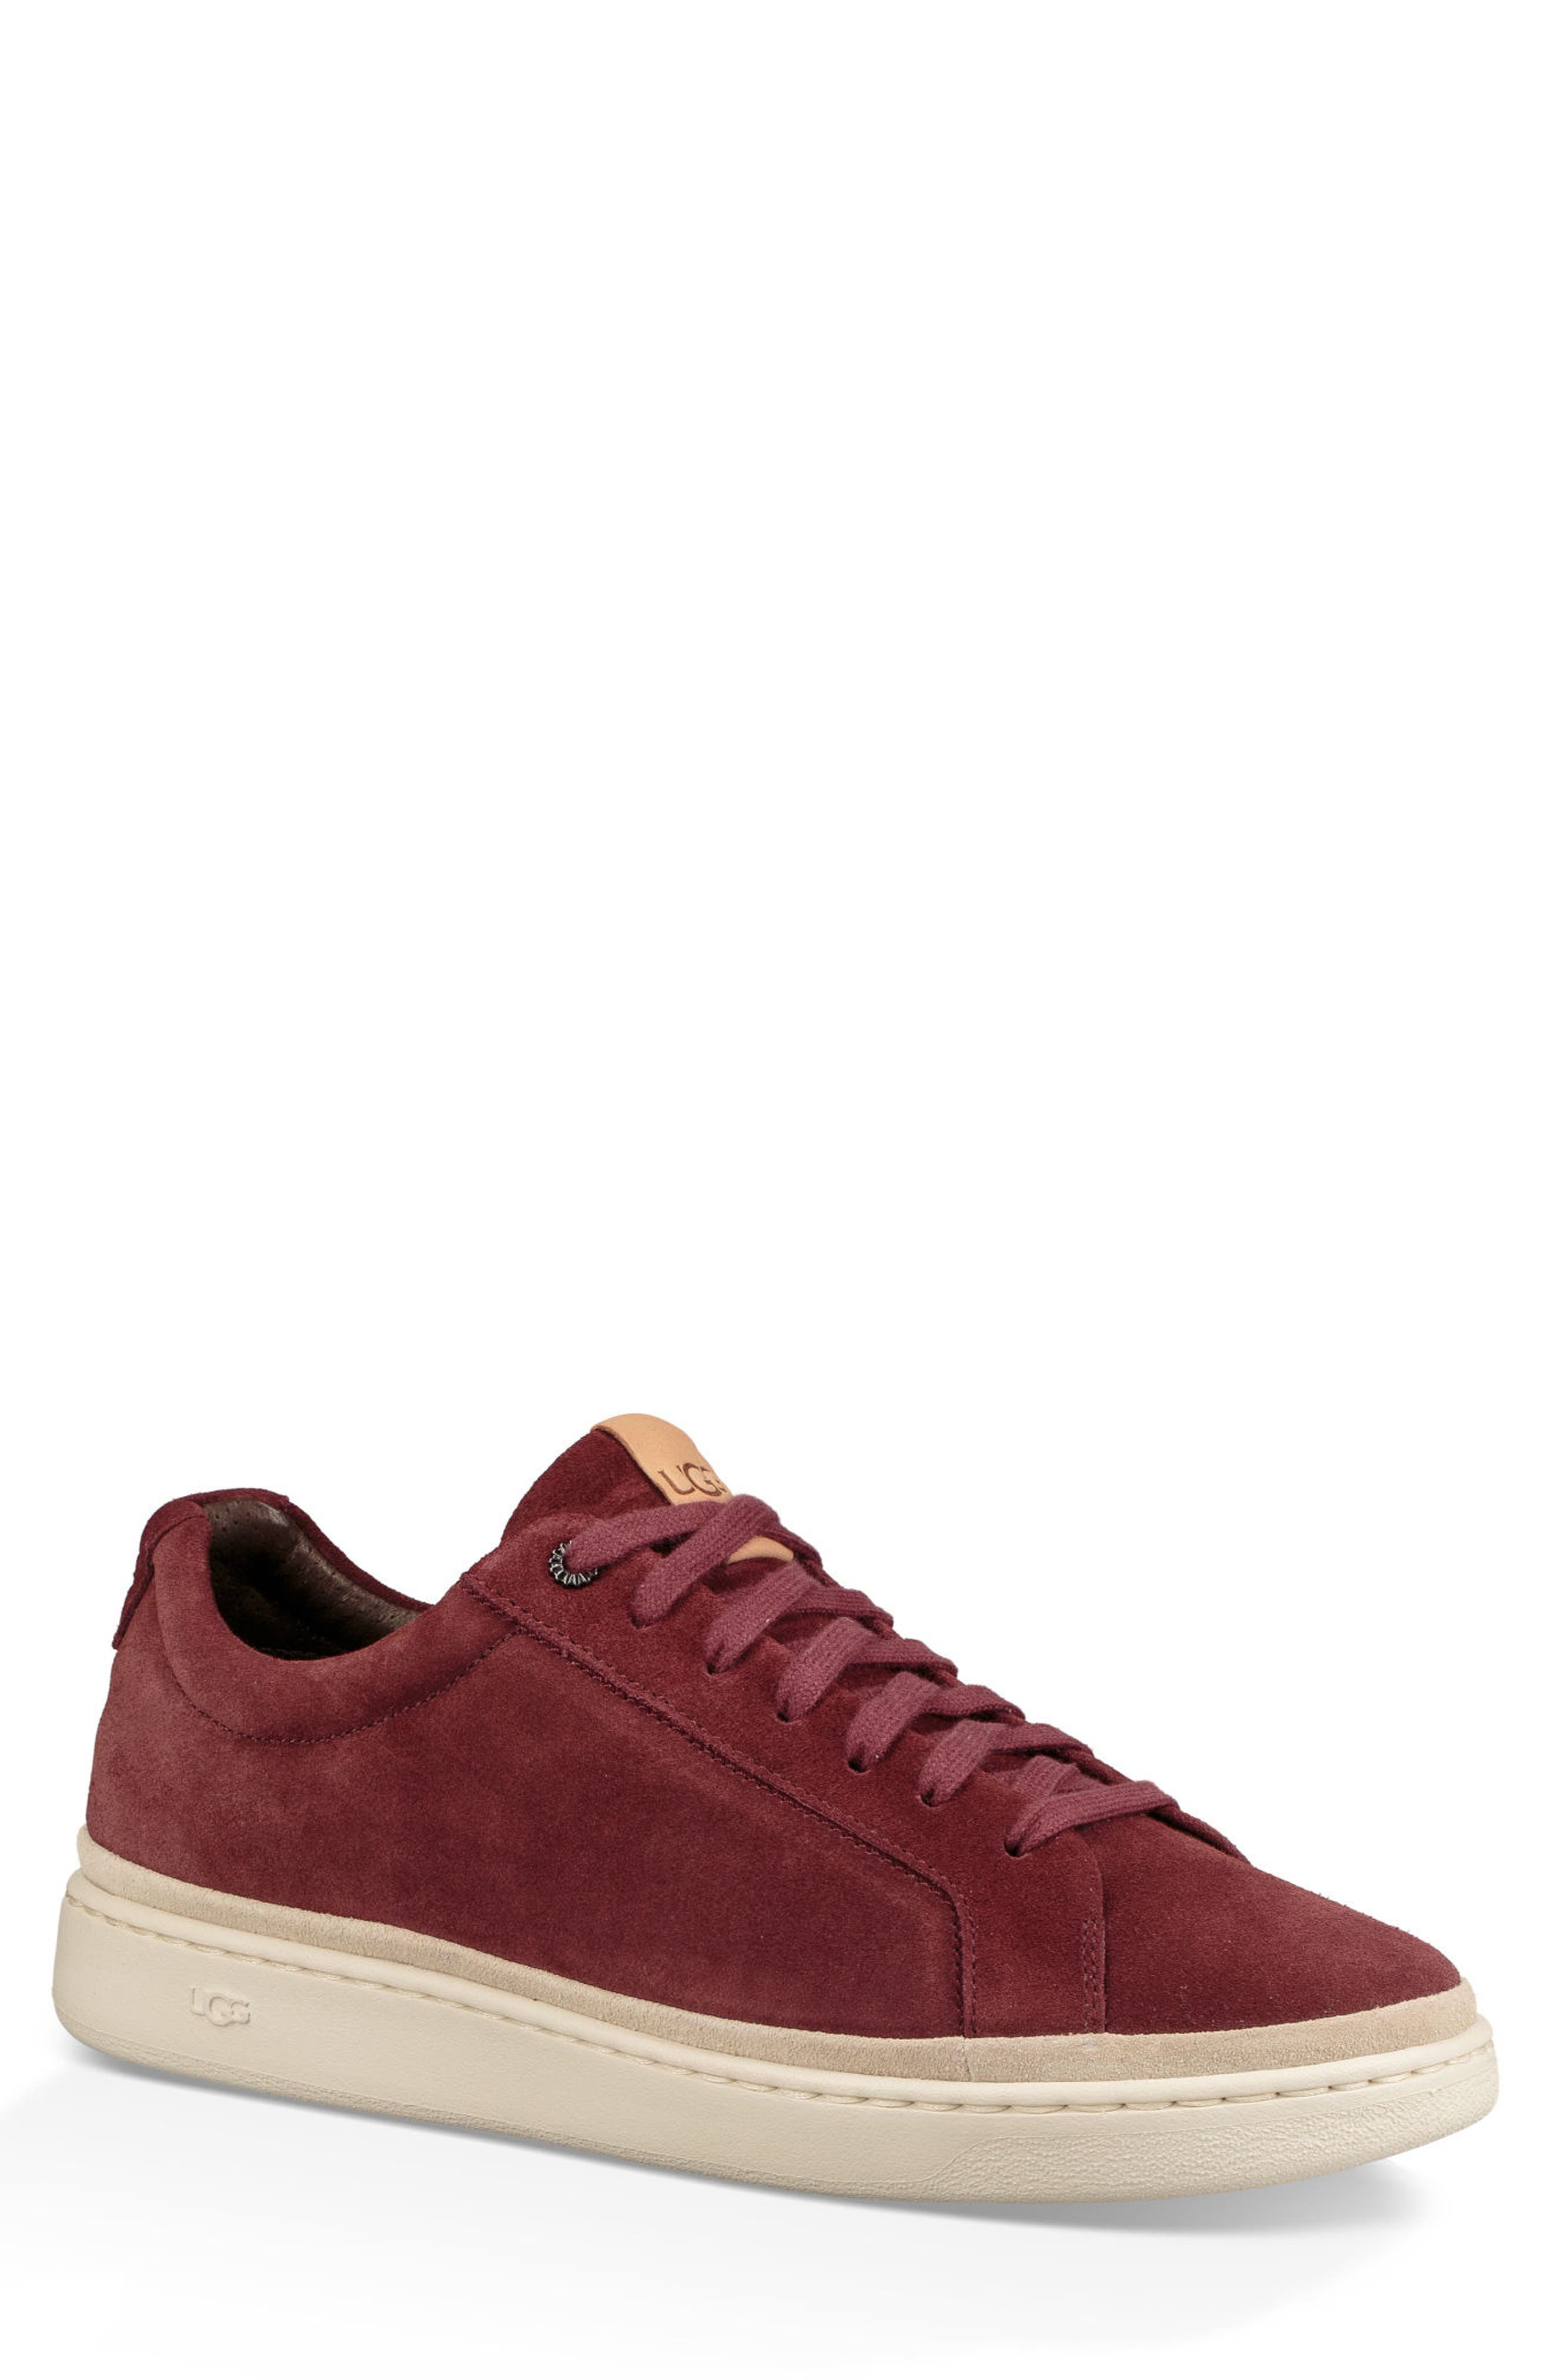 Brecken Sneaker,                             Main thumbnail 1, color,                             Pinot Noir Leather